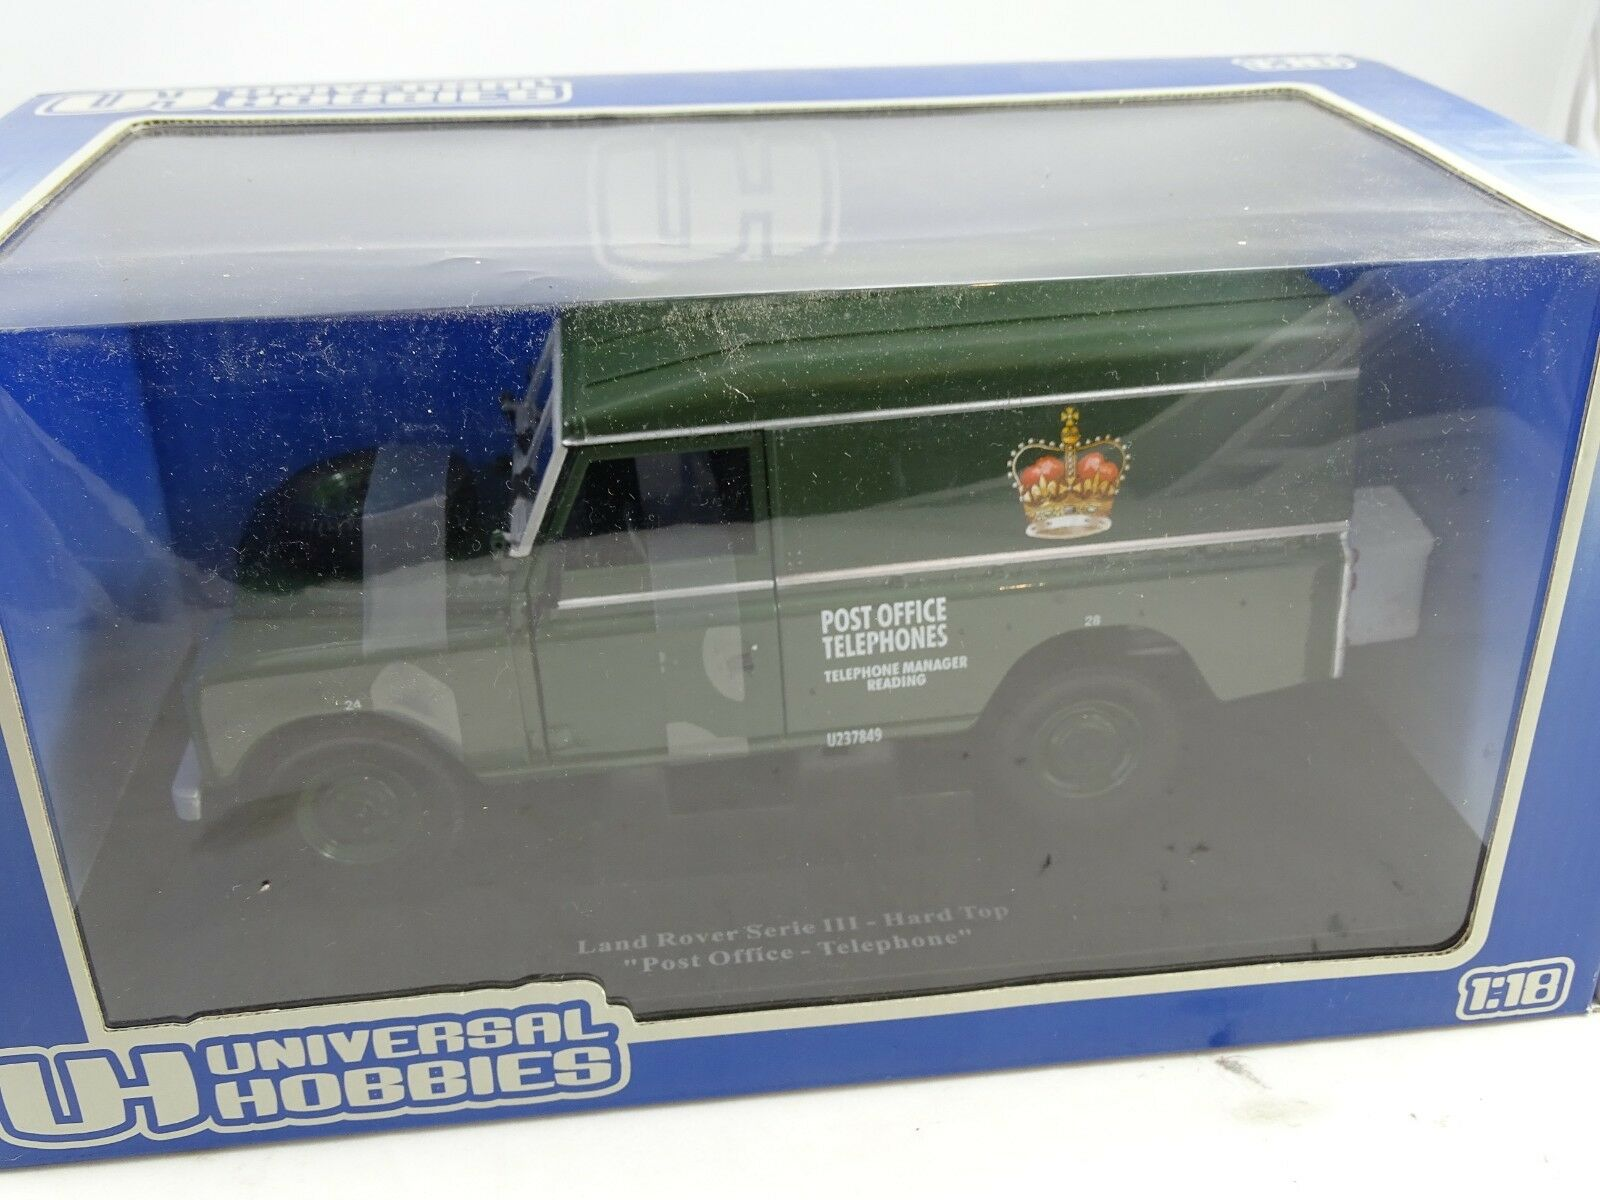 1 18 Universal Hobbies Land Rover Series III Hard Top Post Office Telephone RARE §